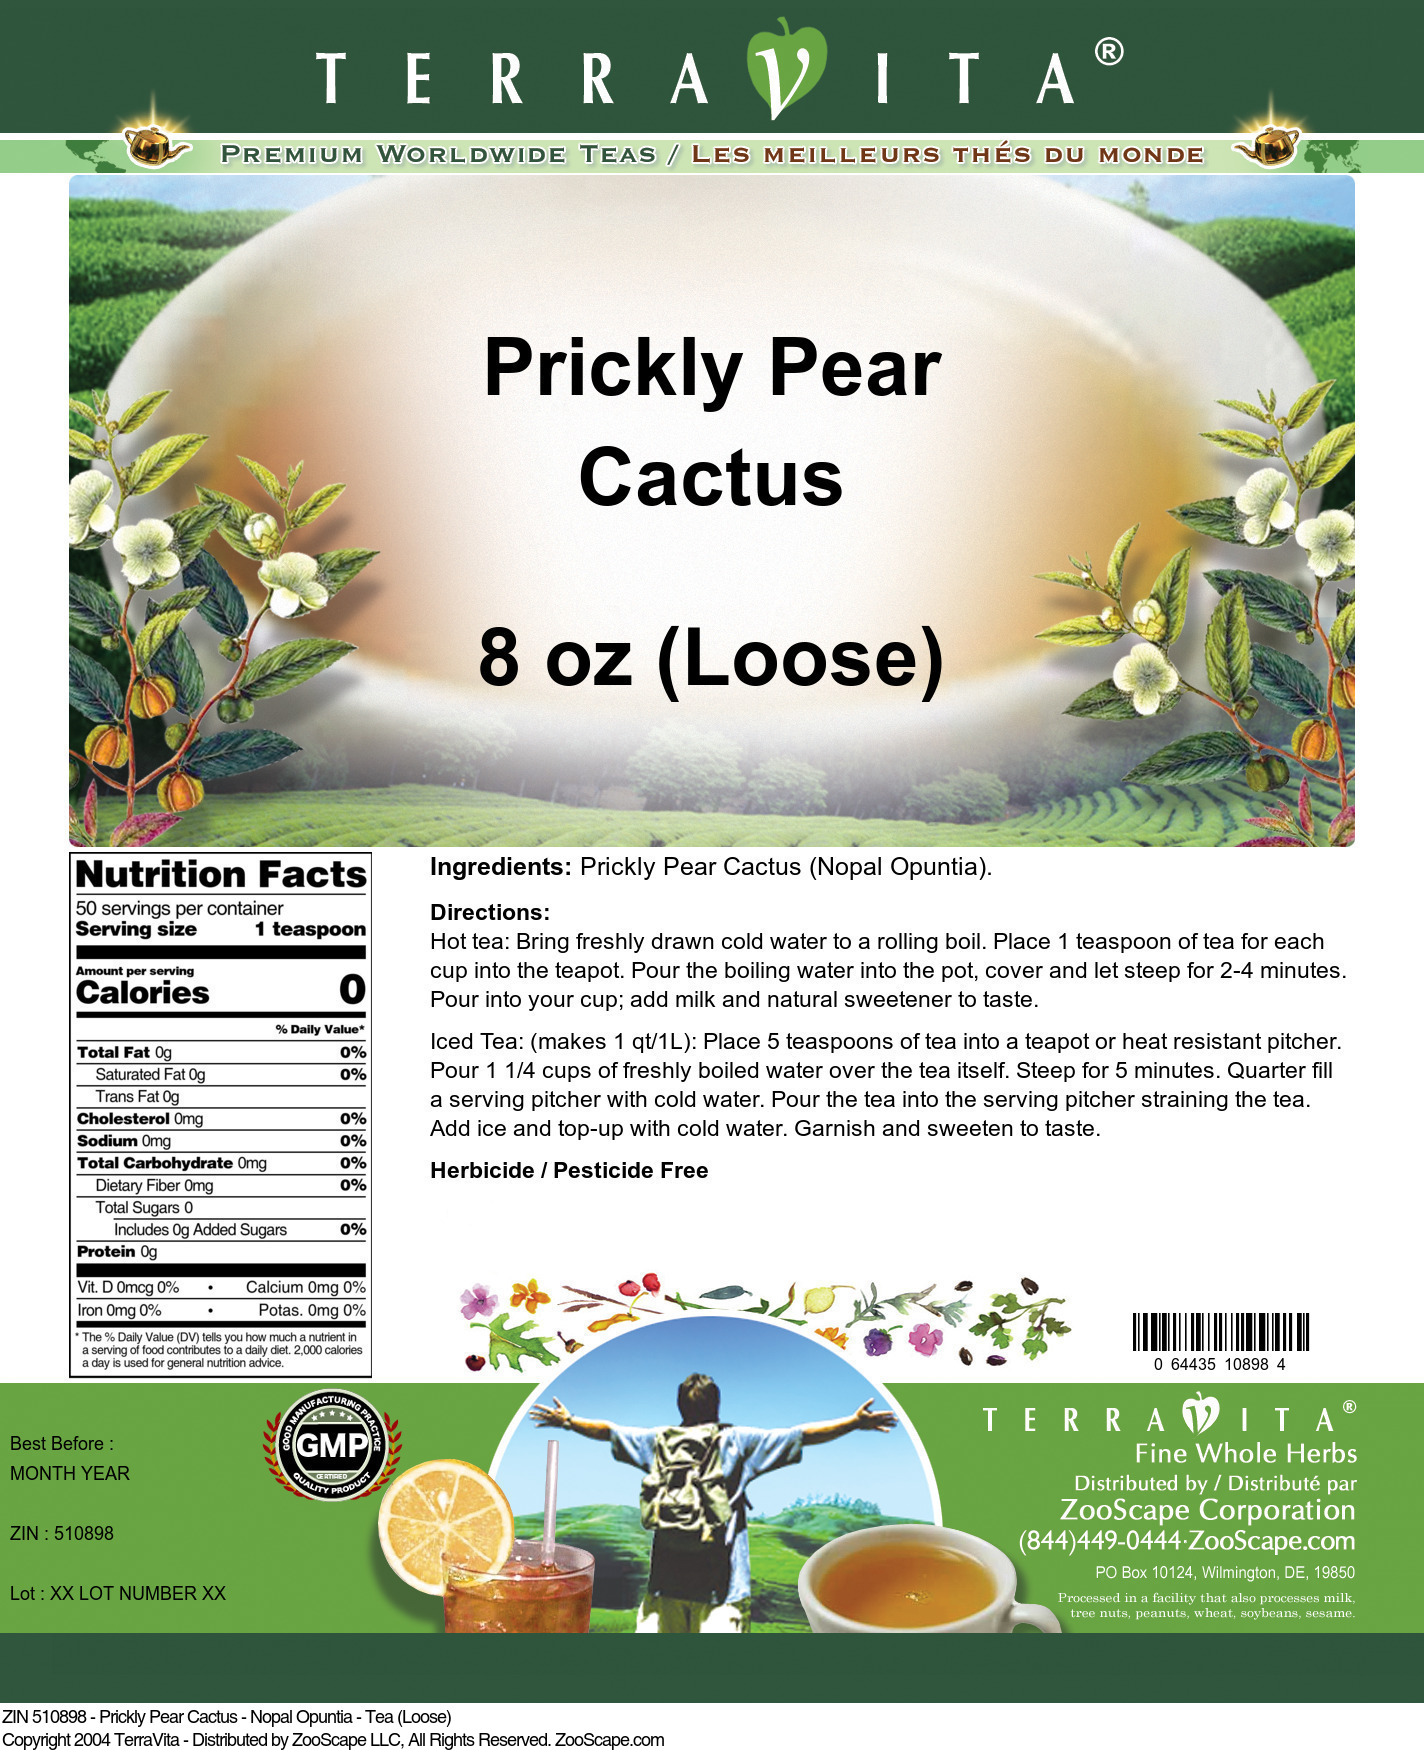 Prickly Pear Cactus - Nopal Opuntia - Tea (Loose)